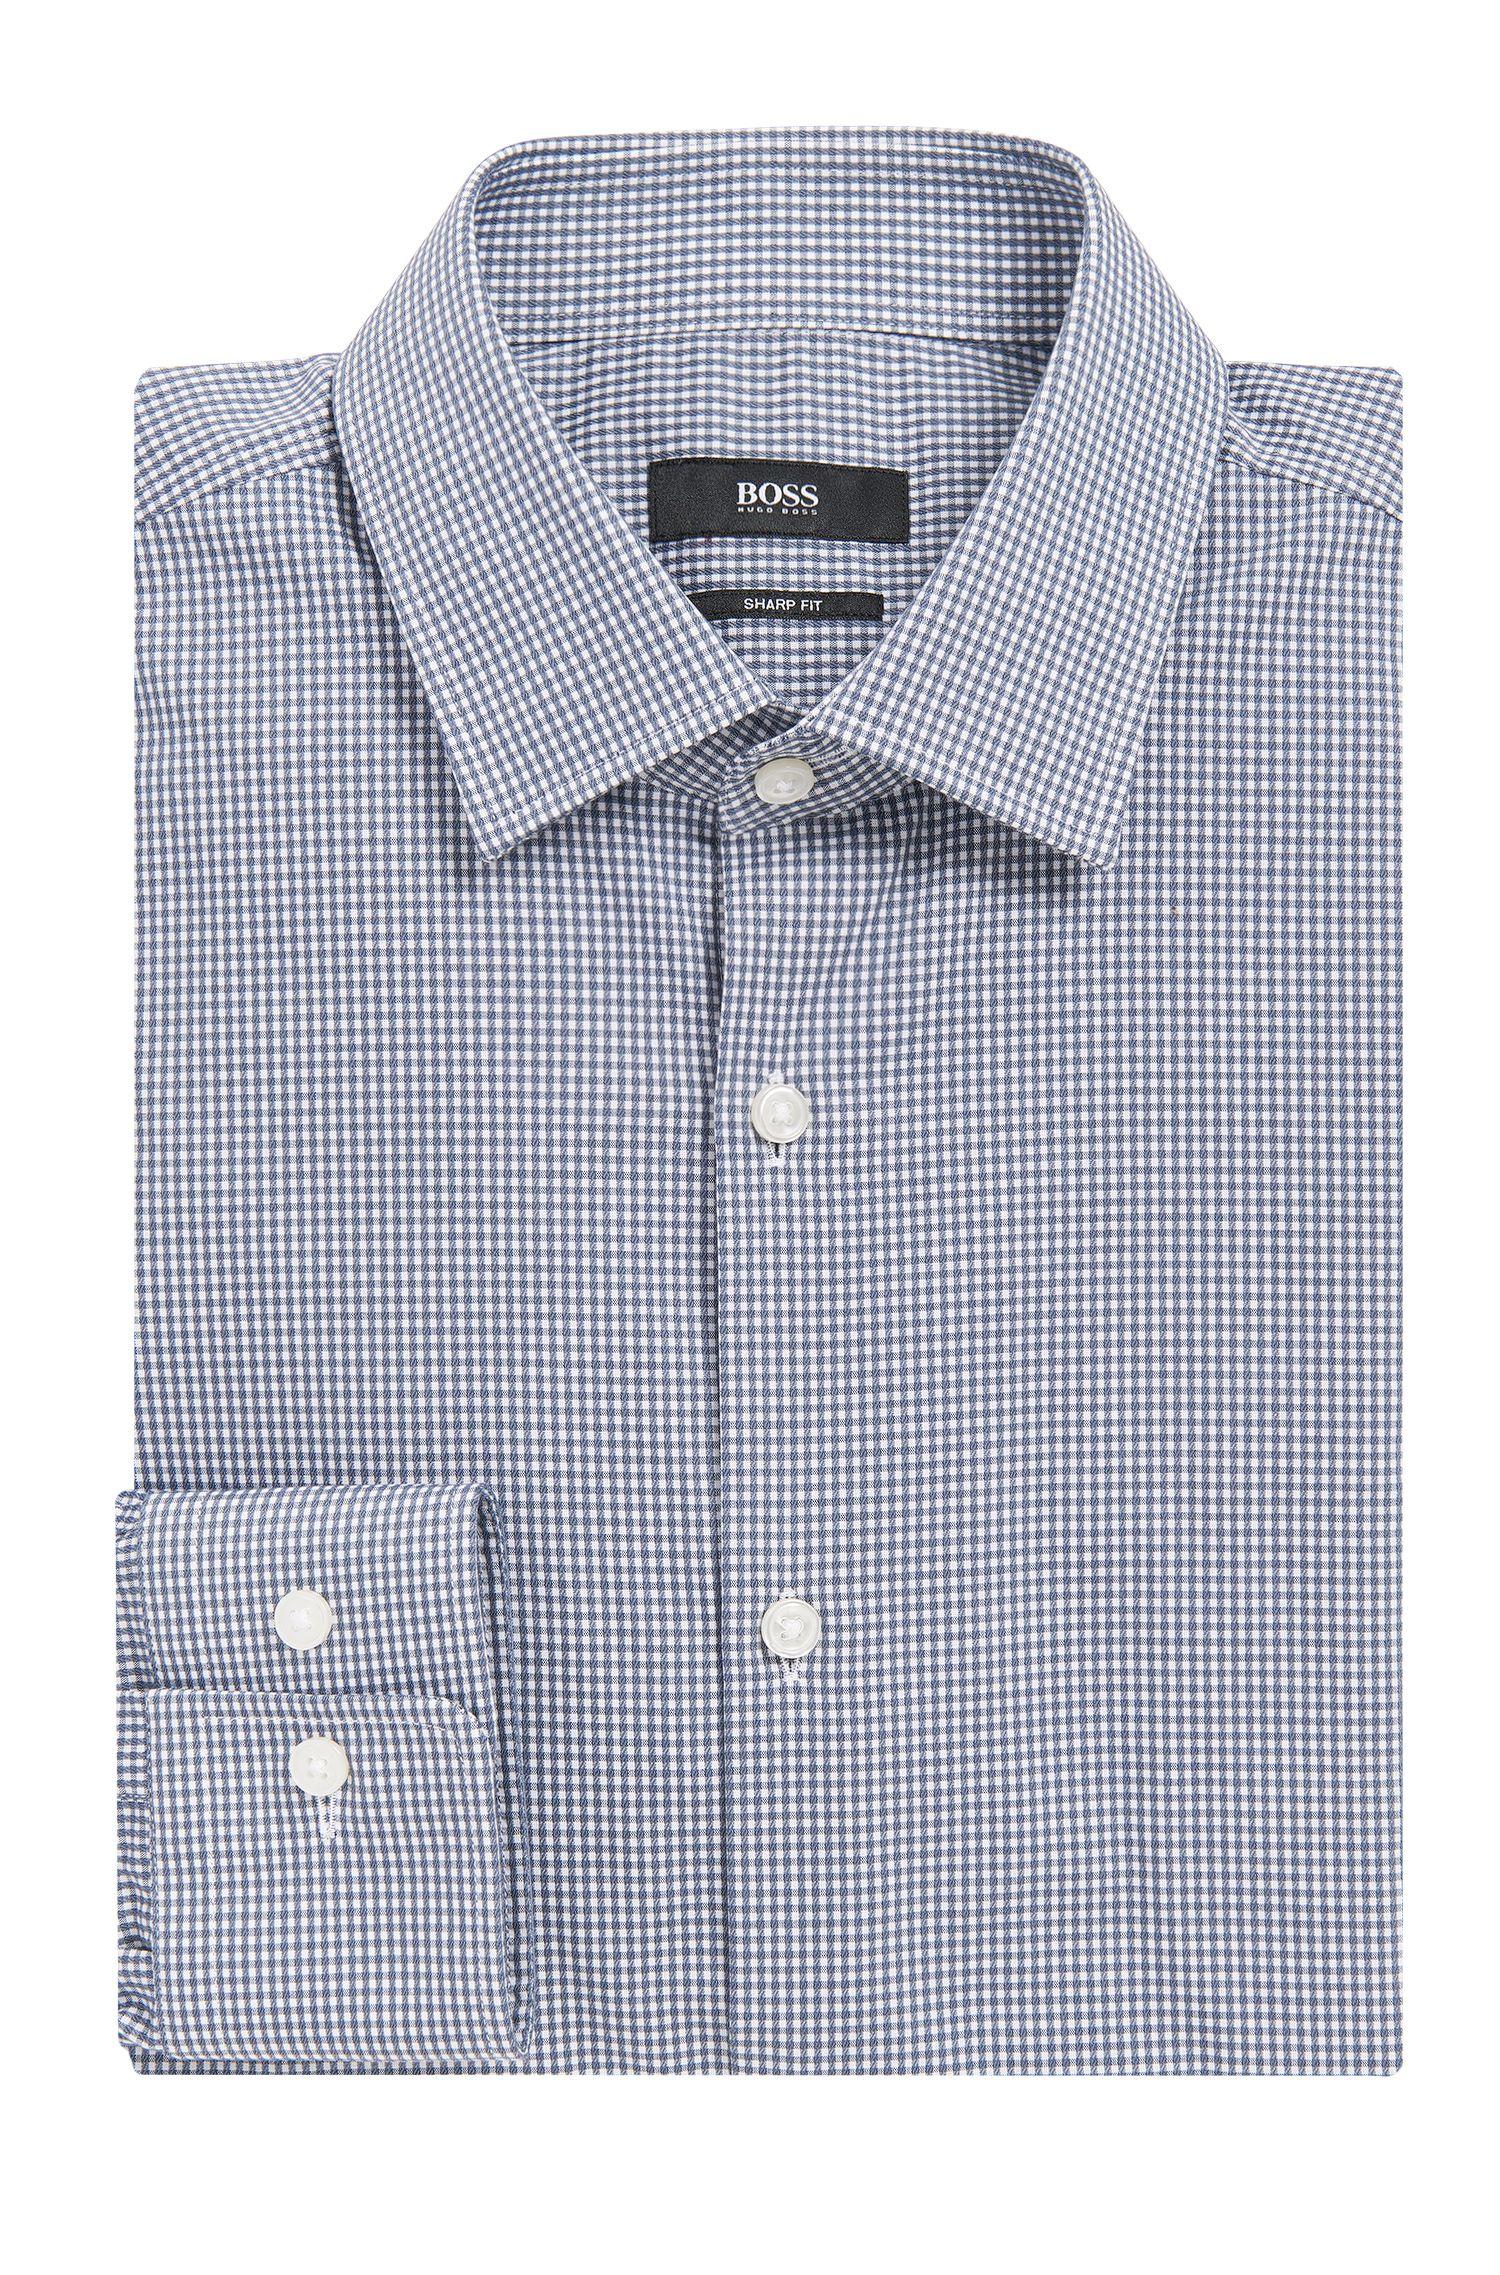 Gingham Cotton Dress Shirt, Sharp Fit | Marley US